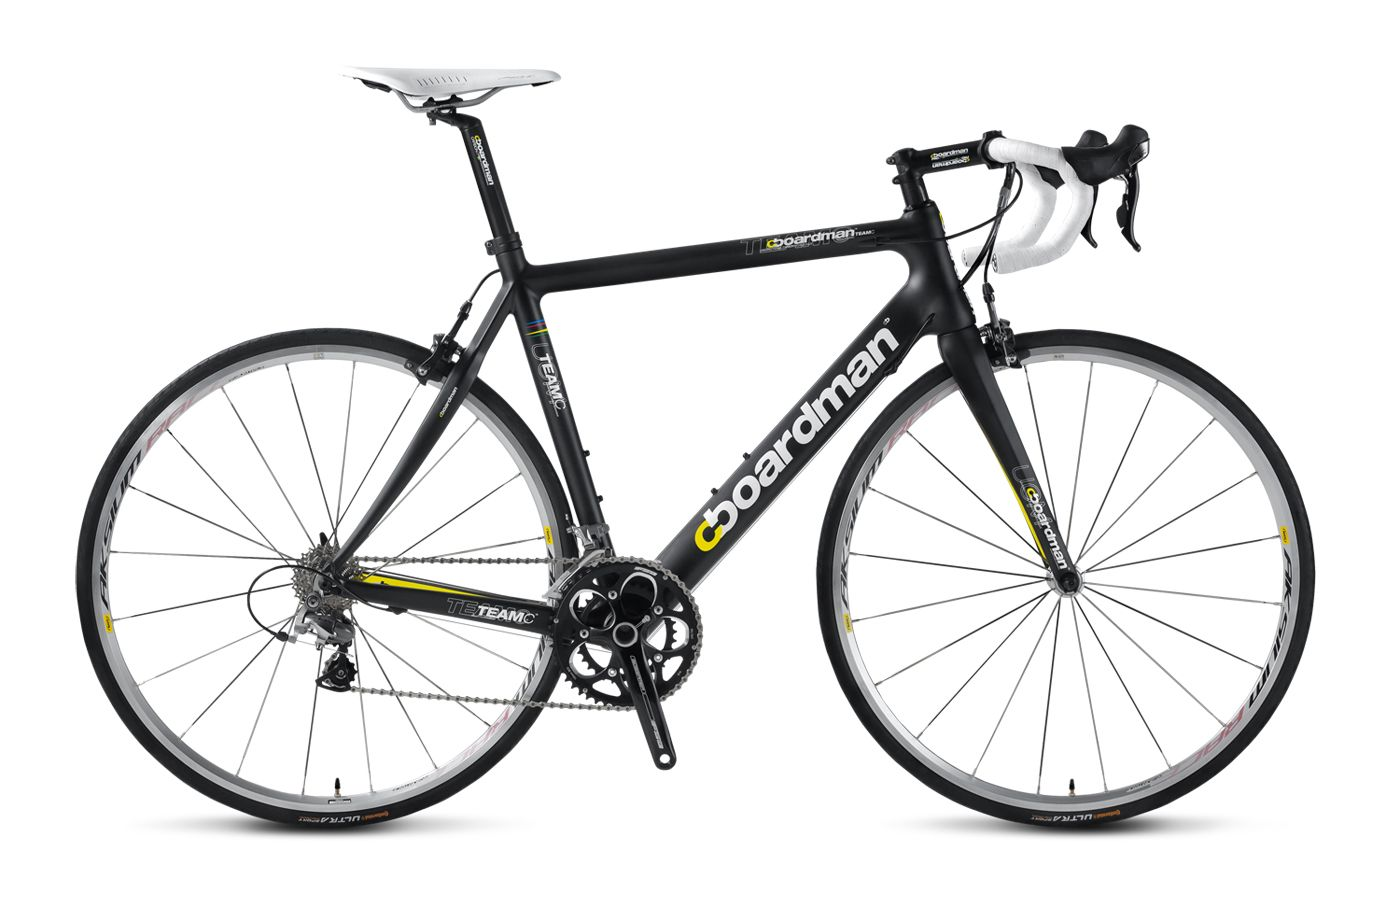 Boardman Team Carbon 105 | Bikes | Pinterest